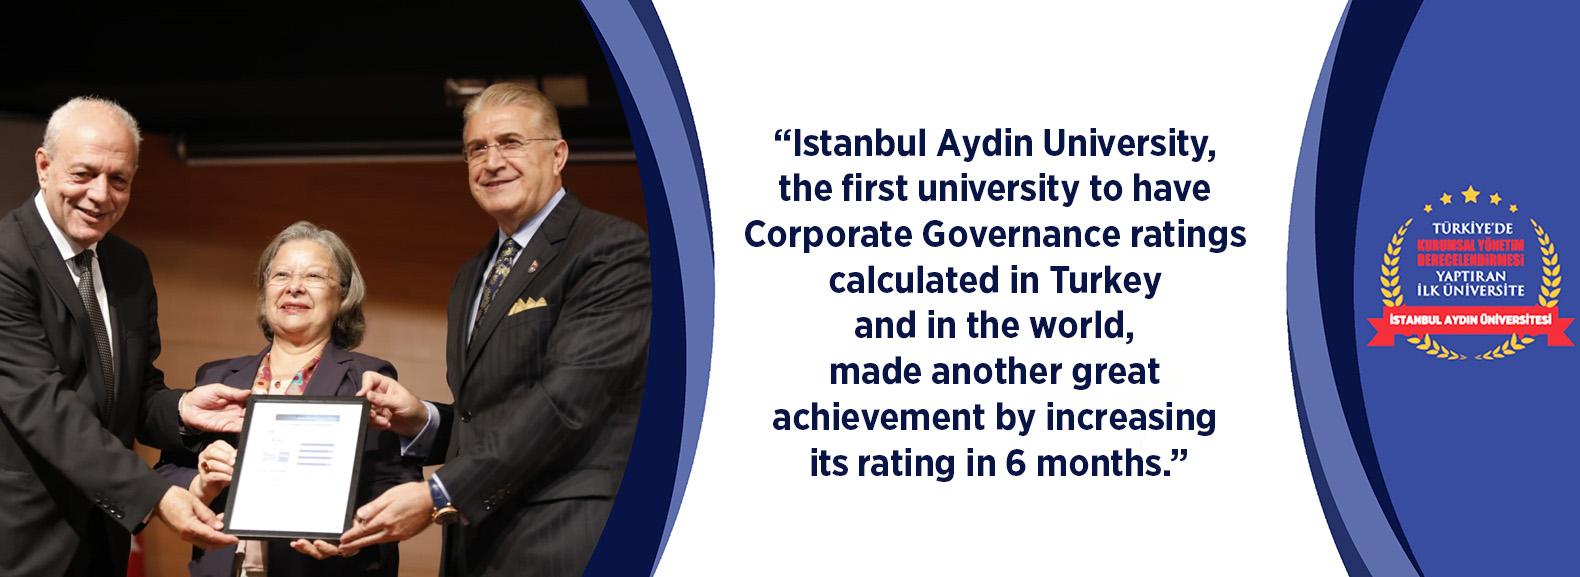 Istanbul Aydin University